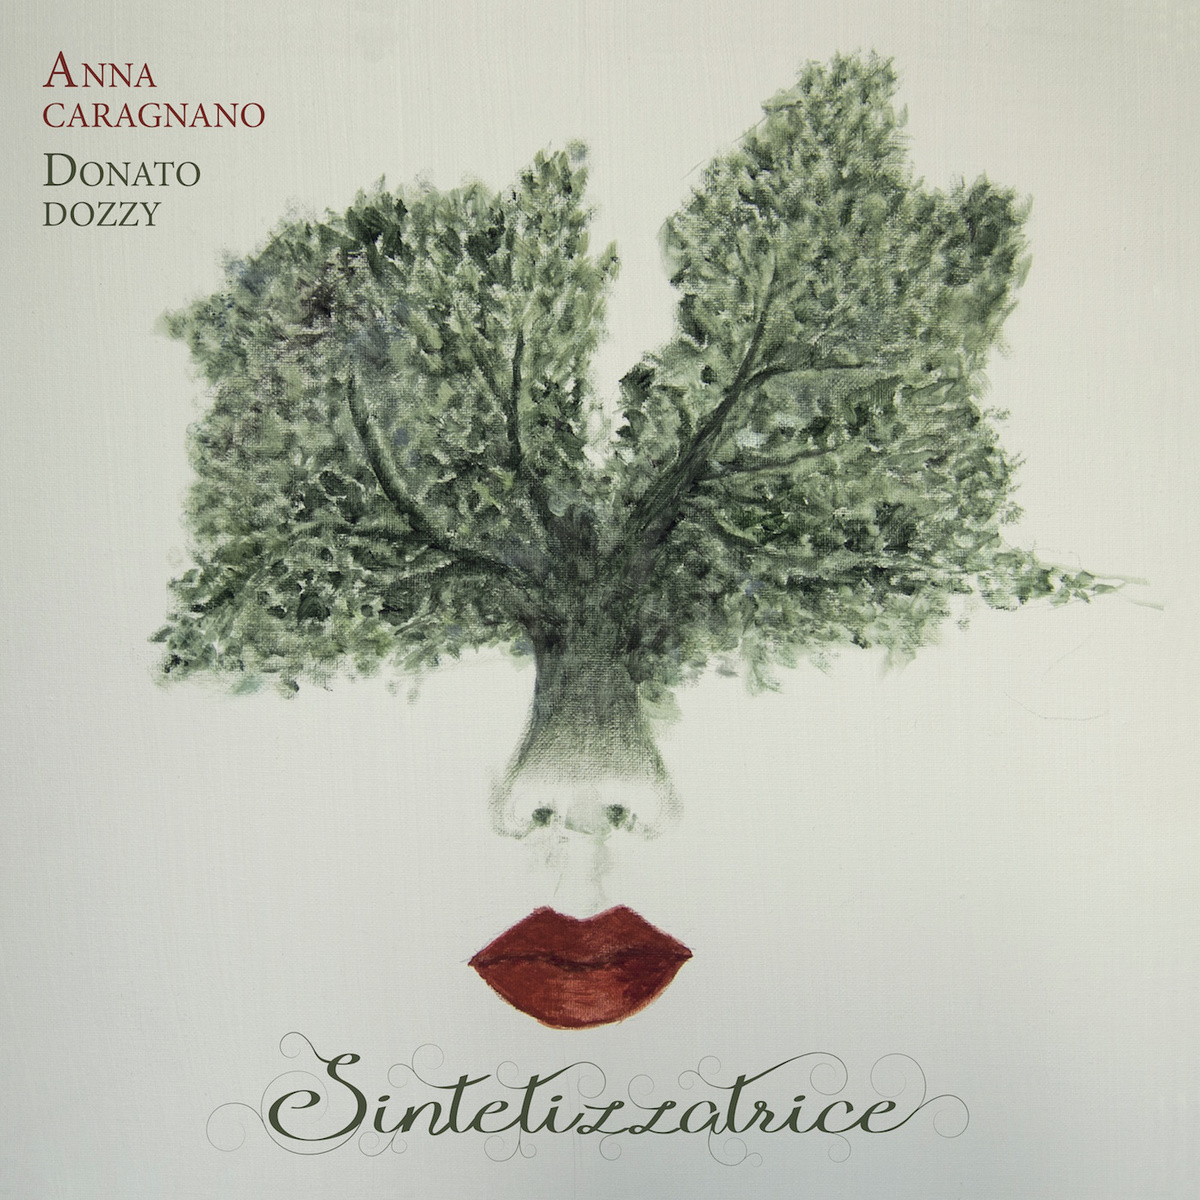 01 Caragnano-Dozzy-Sintetizzatrice